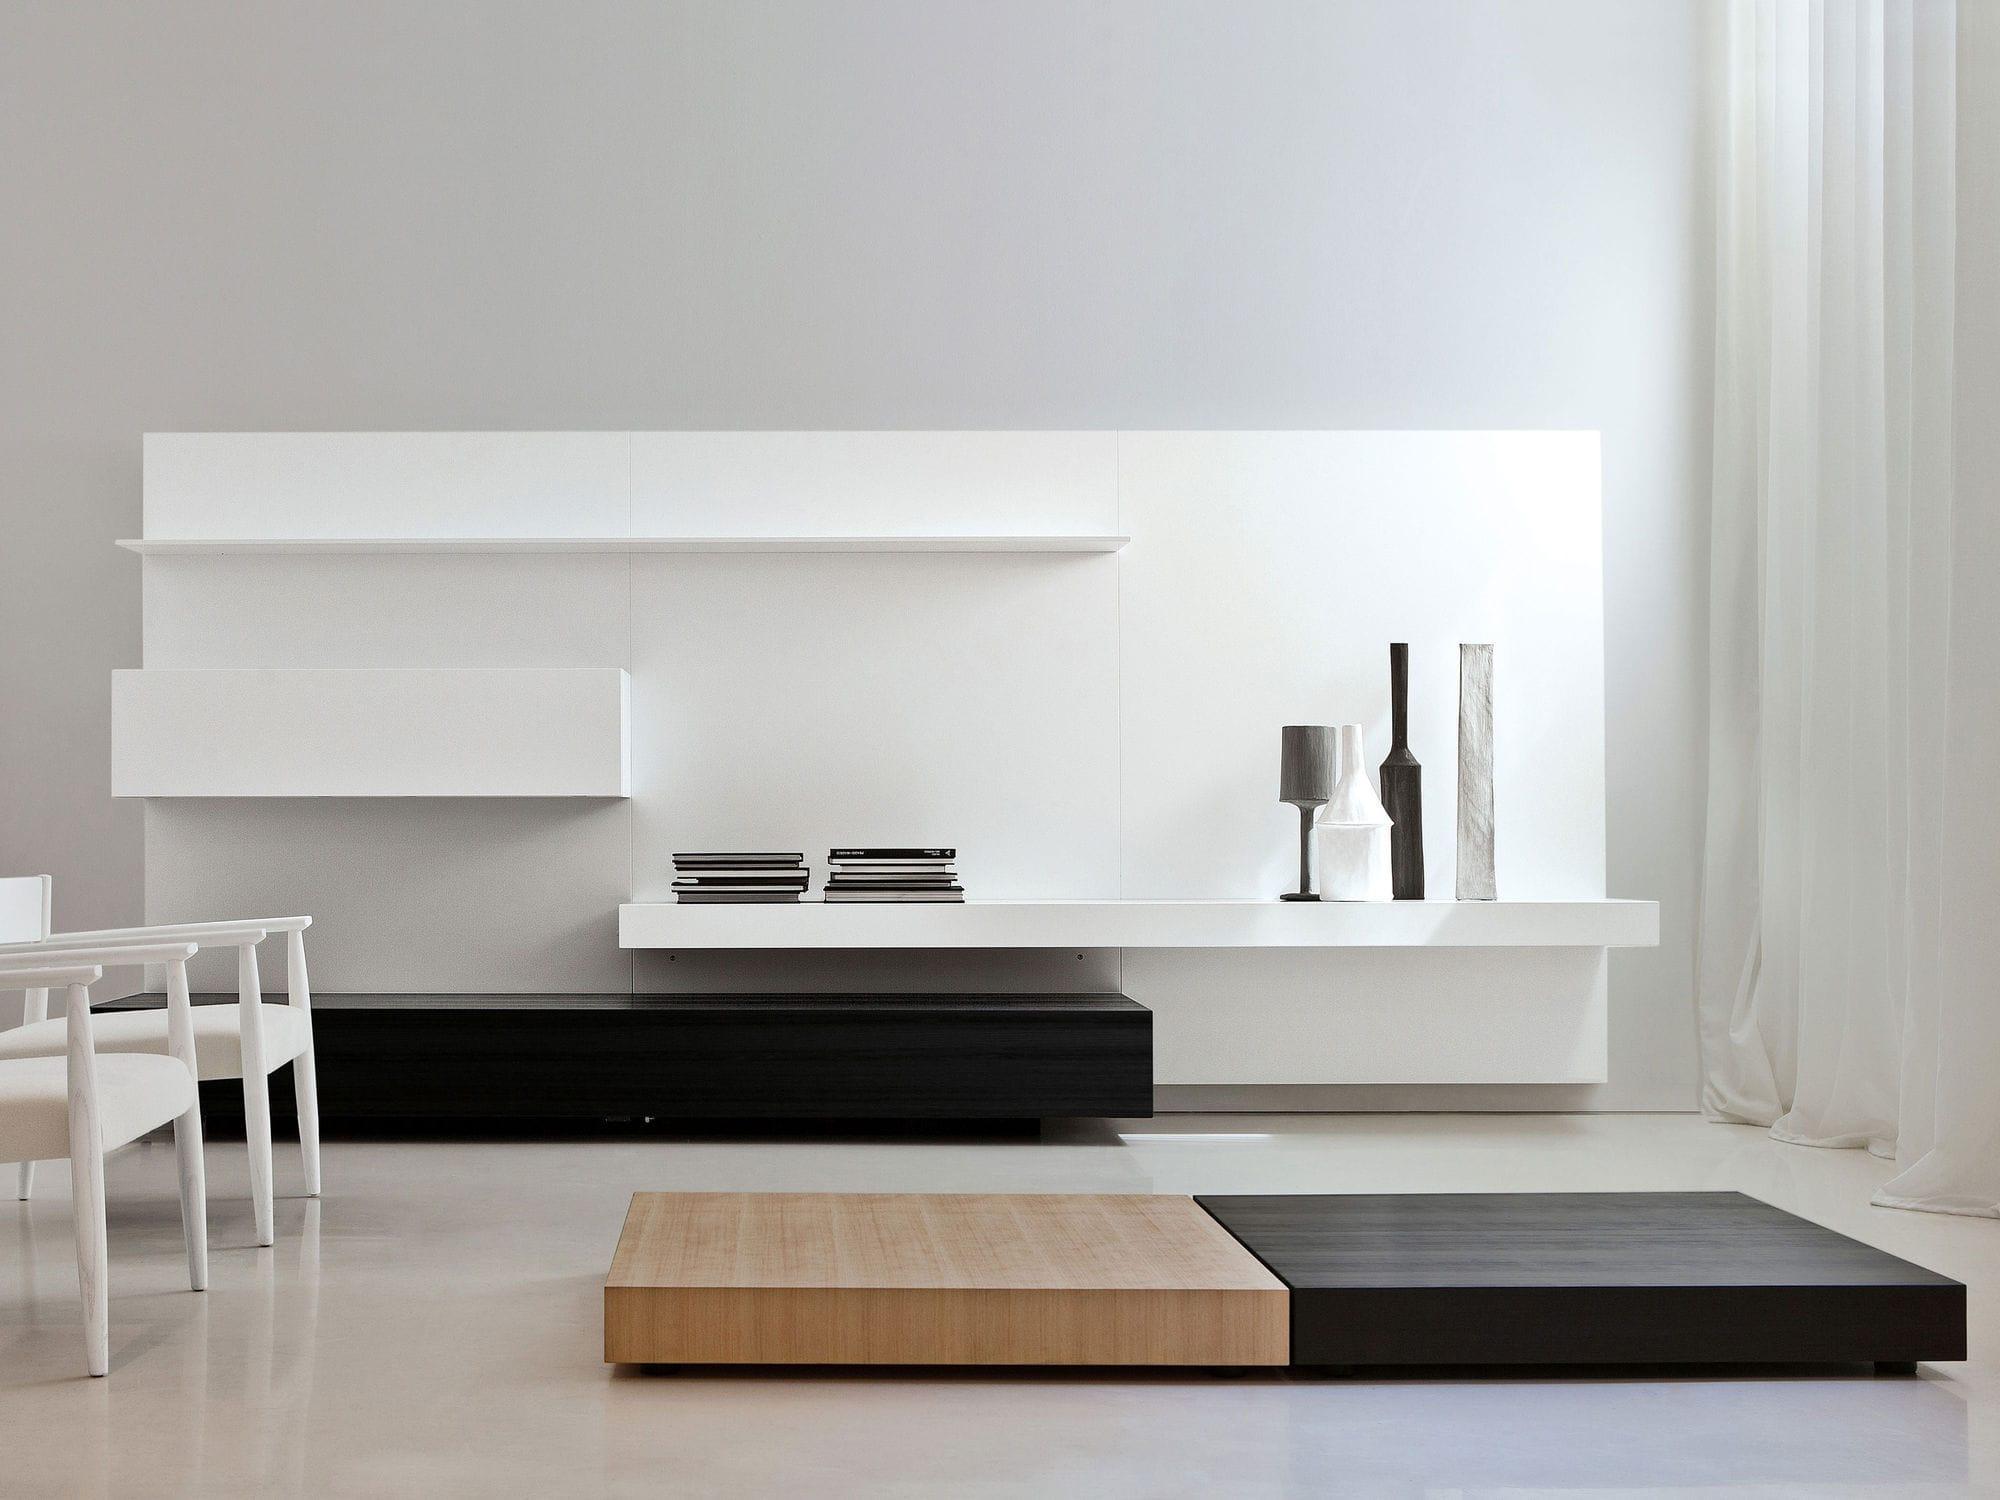 contemporary coffee table  wooden  rectangular  square  modern  -  contemporary coffee table  wooden  rectangular  square modern pancaporro